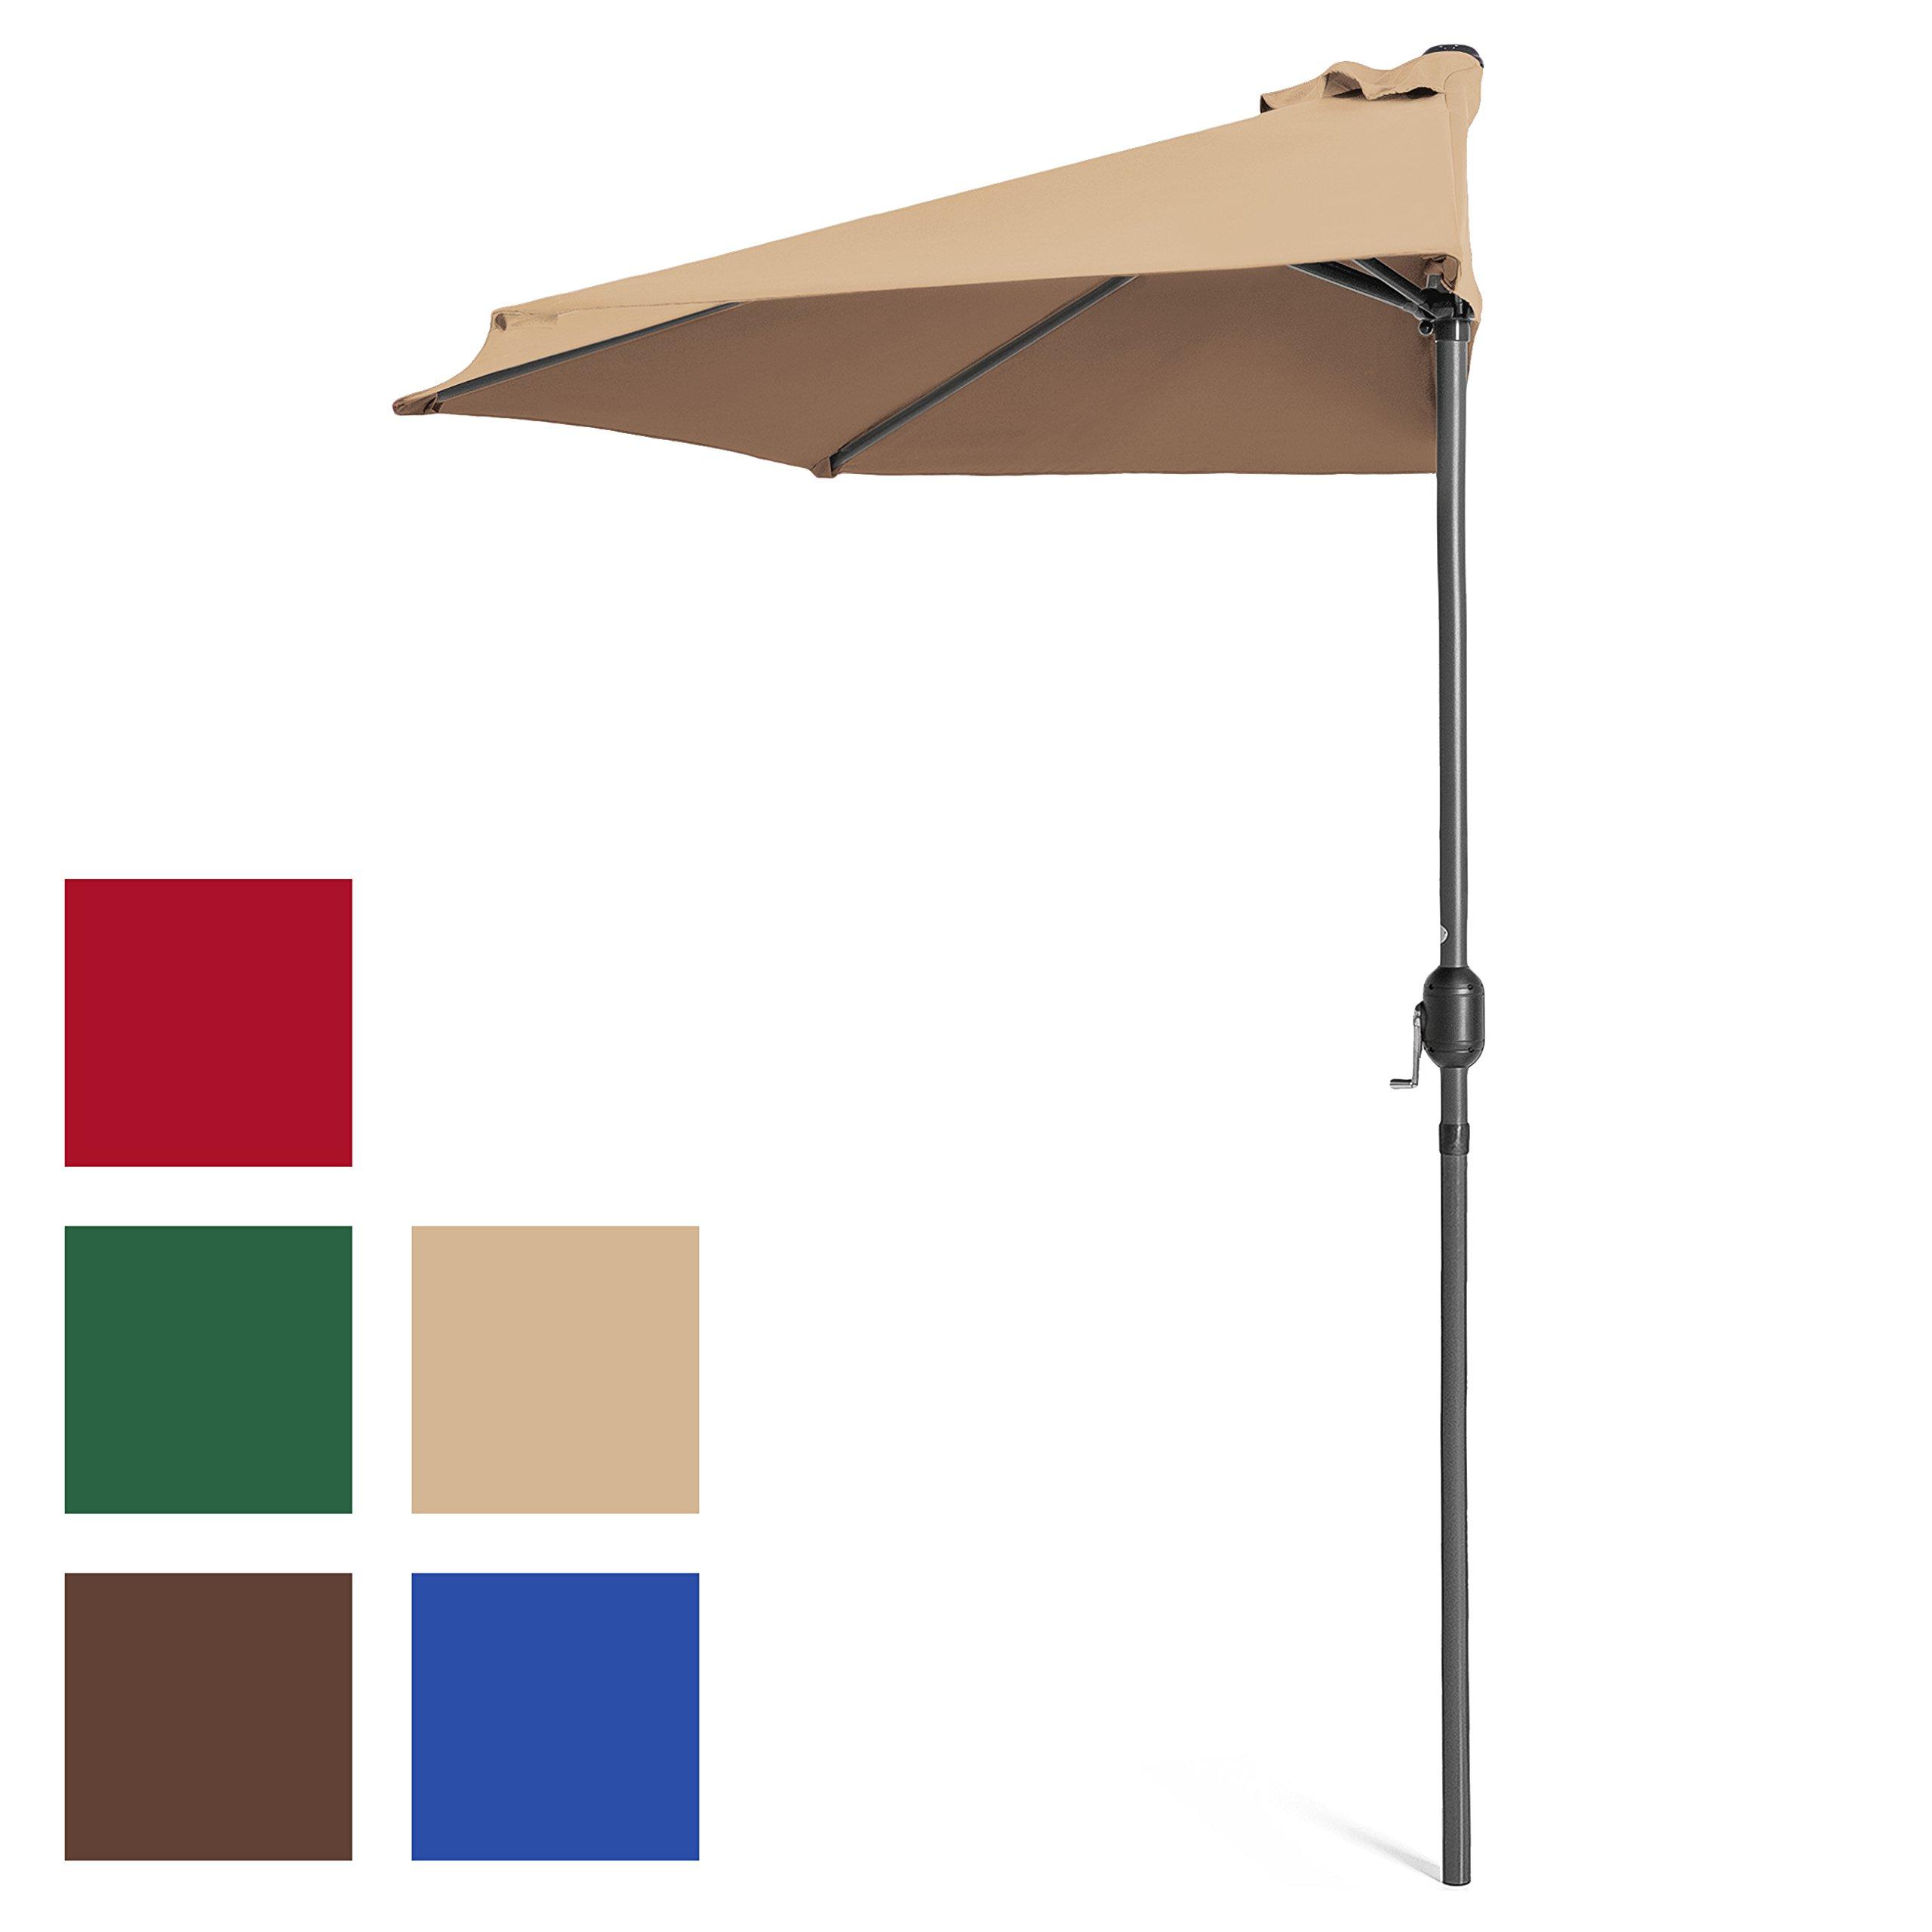 Best Choice Products 9ft Steel Half Patio Umbrella w/Crank - Tan